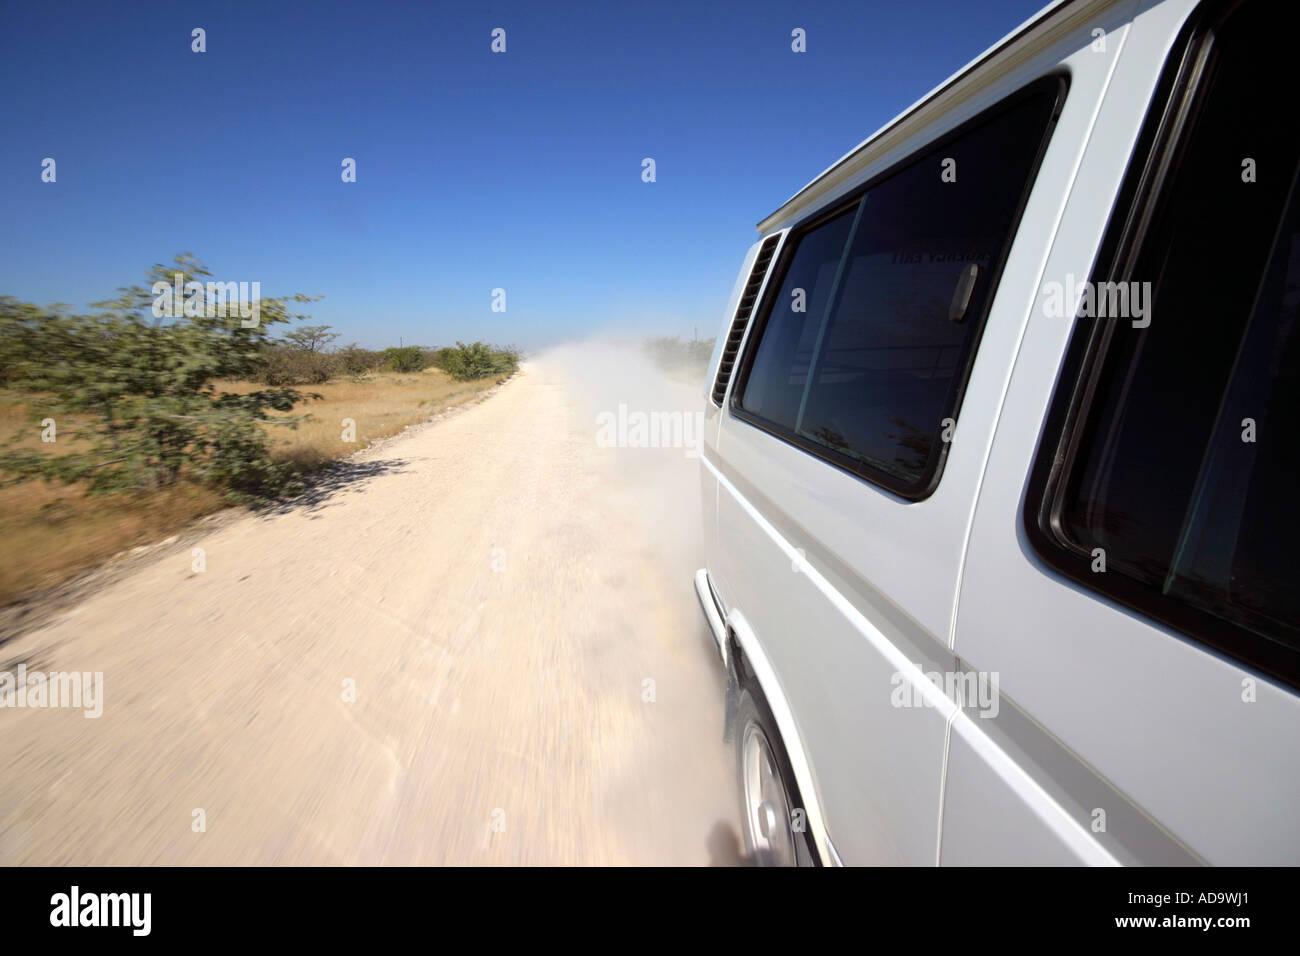 e3c881dc24 White minibus traveling down gravel road in Namibia - Stock Image